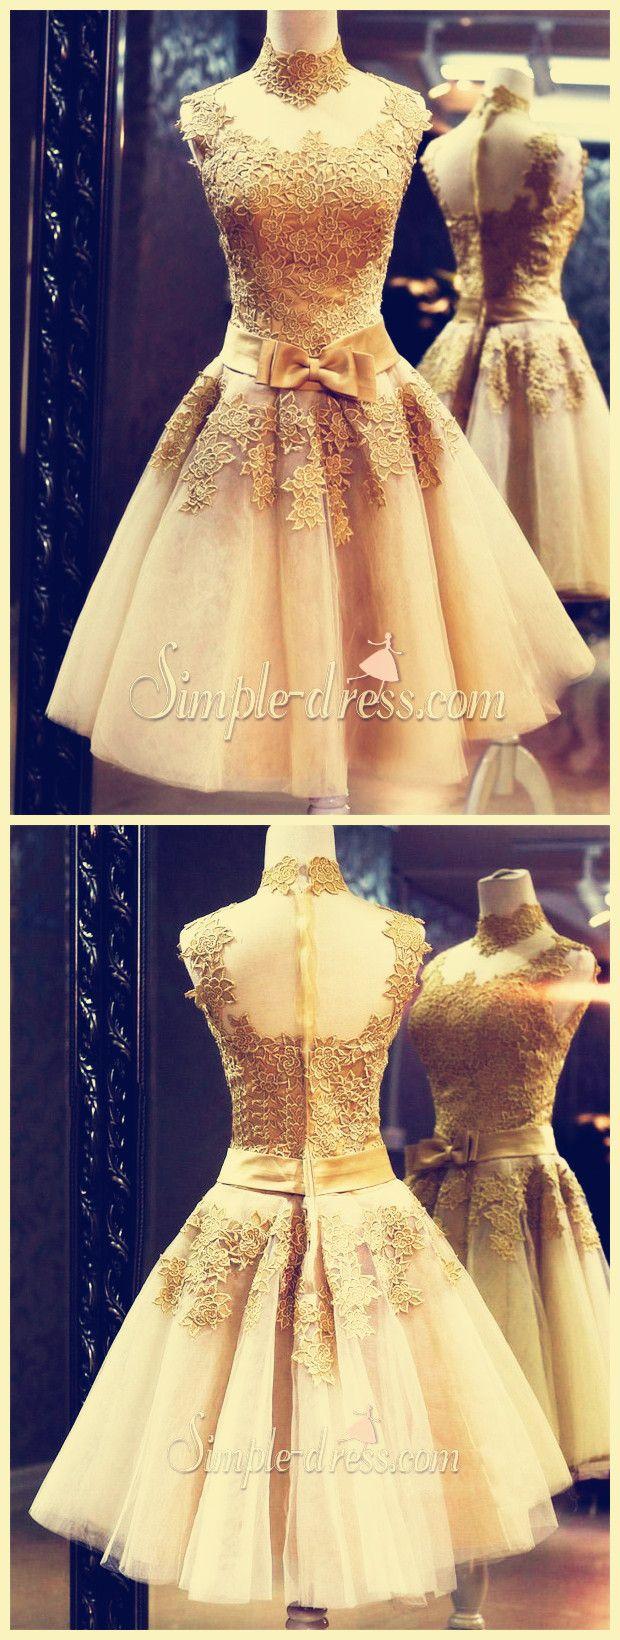 Short Prom Dress,Gold Prom Dress,Prom Dress 2016,A-Line Prom Dress,Knee-Length Prom Dress